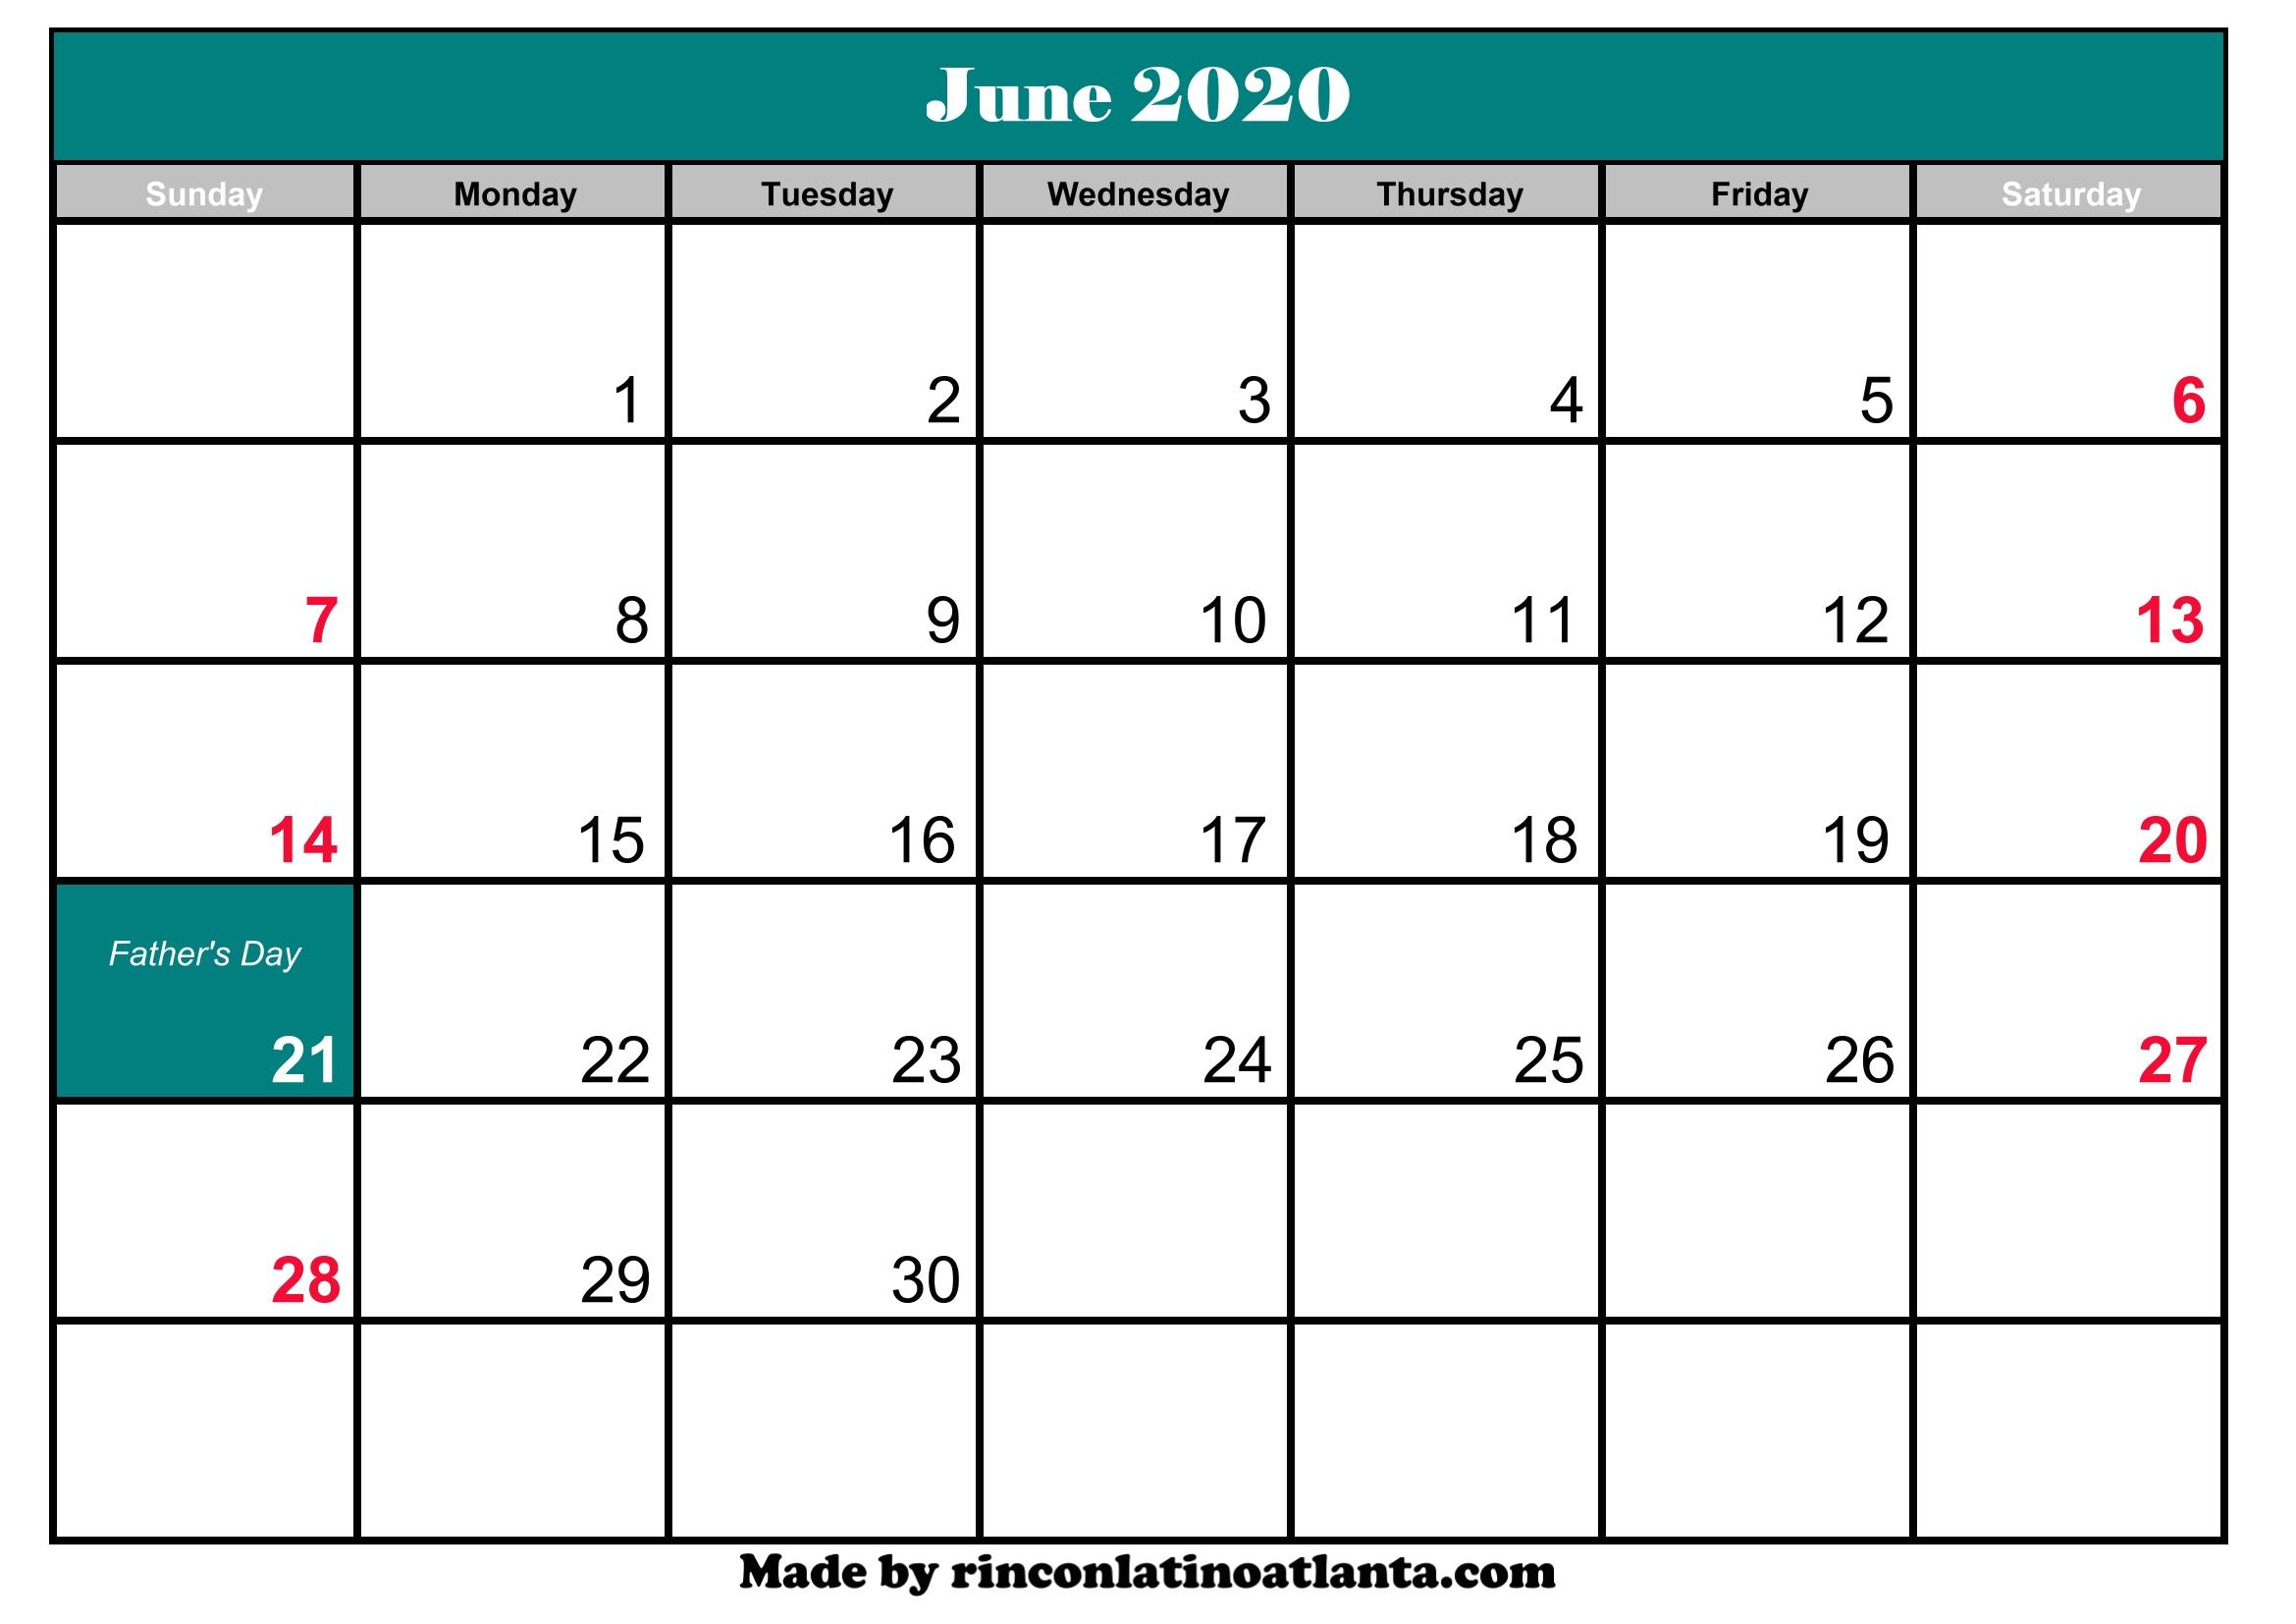 June Calendar 2020 With Holidays June 2020 Calendar Printable With Holidays | Calendar Template